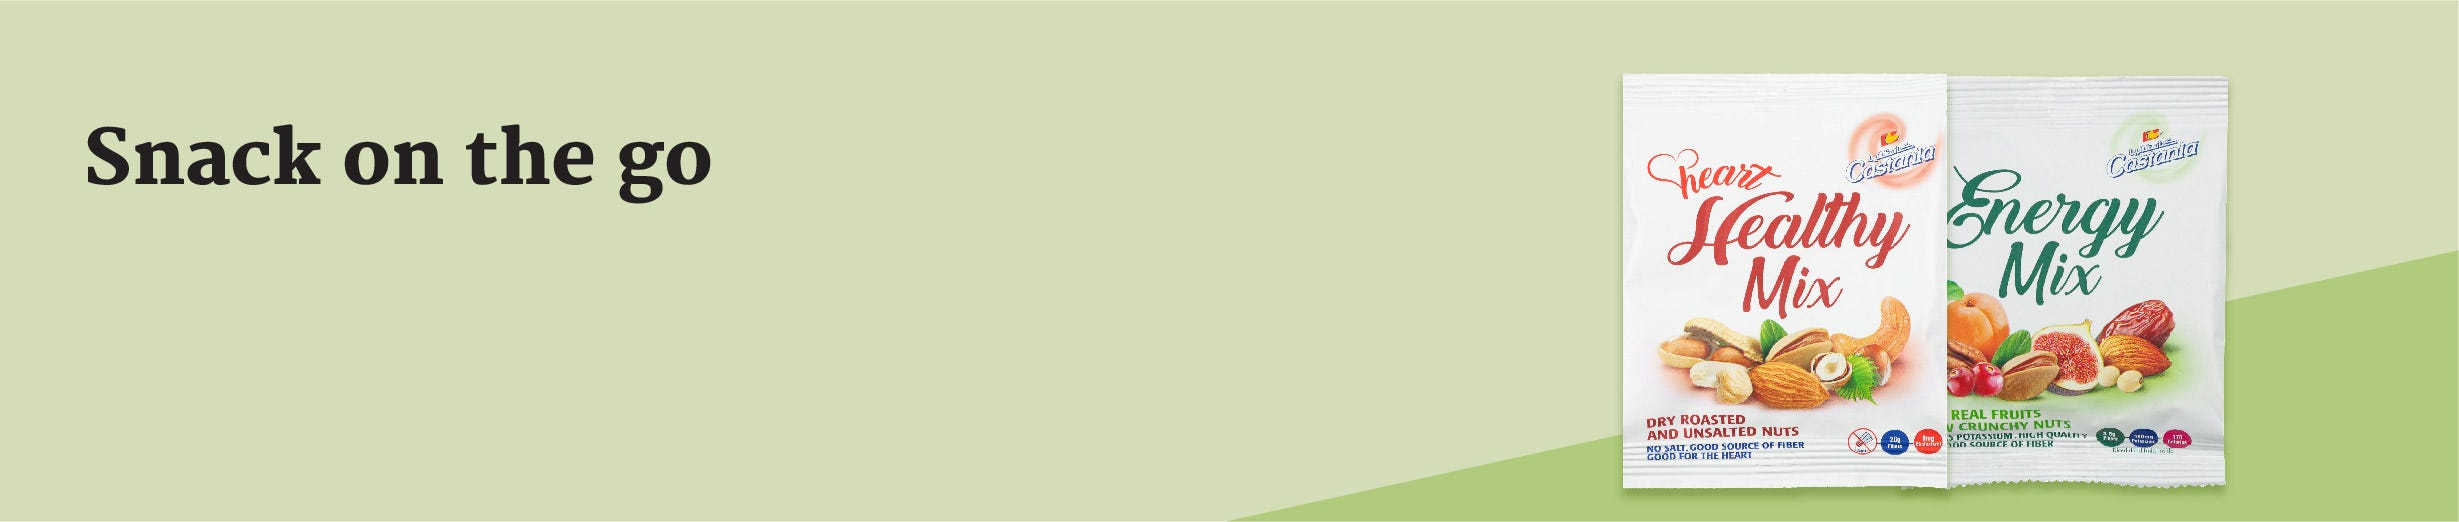 Healthy Organic Tea & Herbals